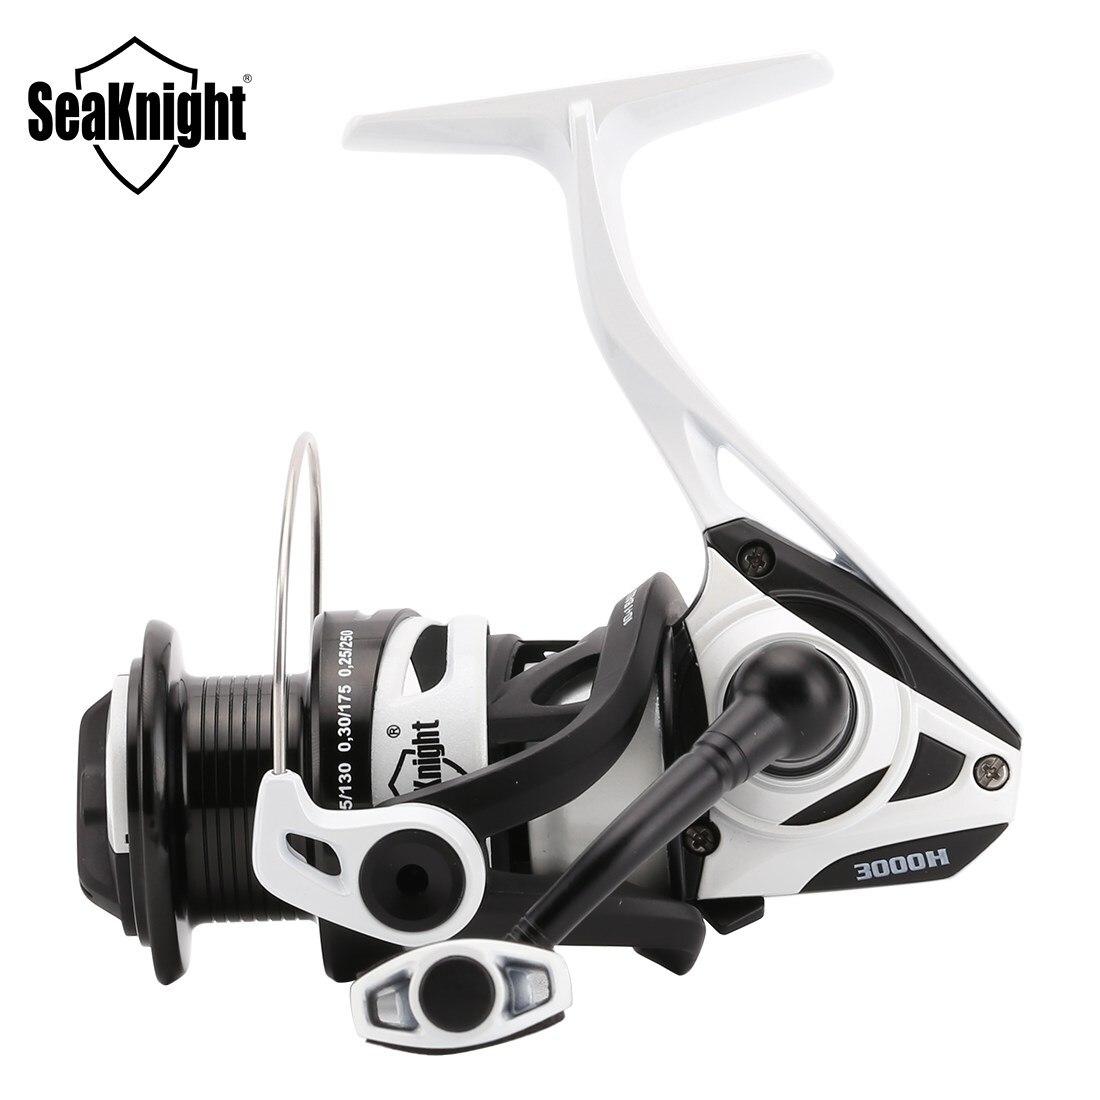 SeaKnight PHANTOM 6.2:1 2000H 3000H 11BB Spinning Fishing Reel Metal Body Carbon Rotor Fishing Wheel обои loymina phantom артикул ph2 002 1